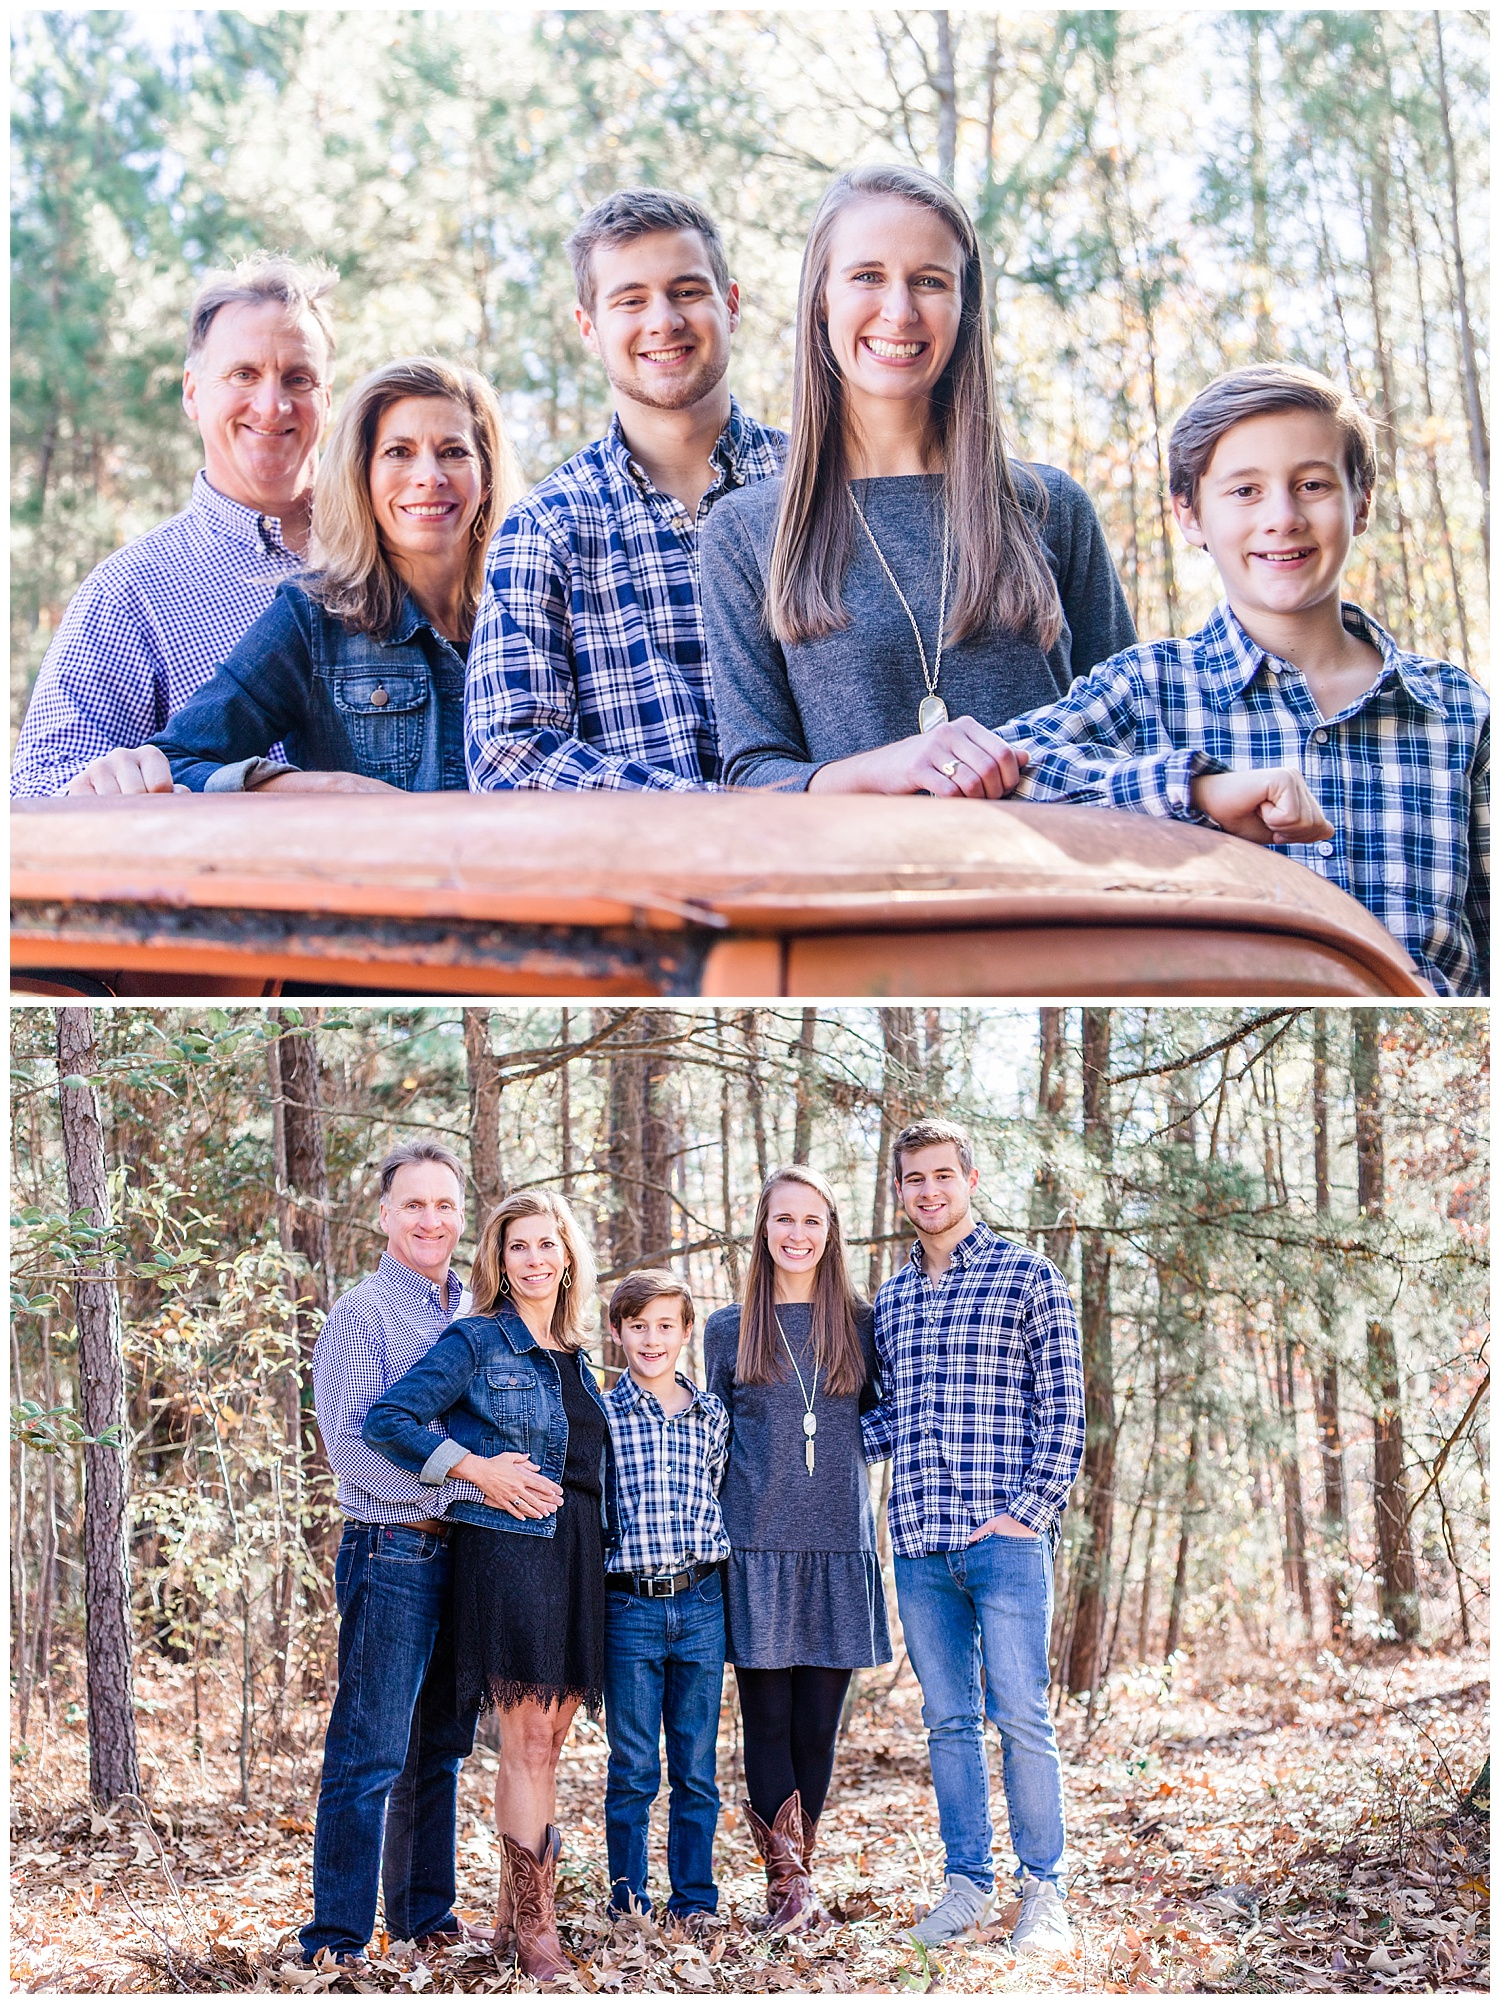 Country Casual Family Portraits in Glen Allen, VA